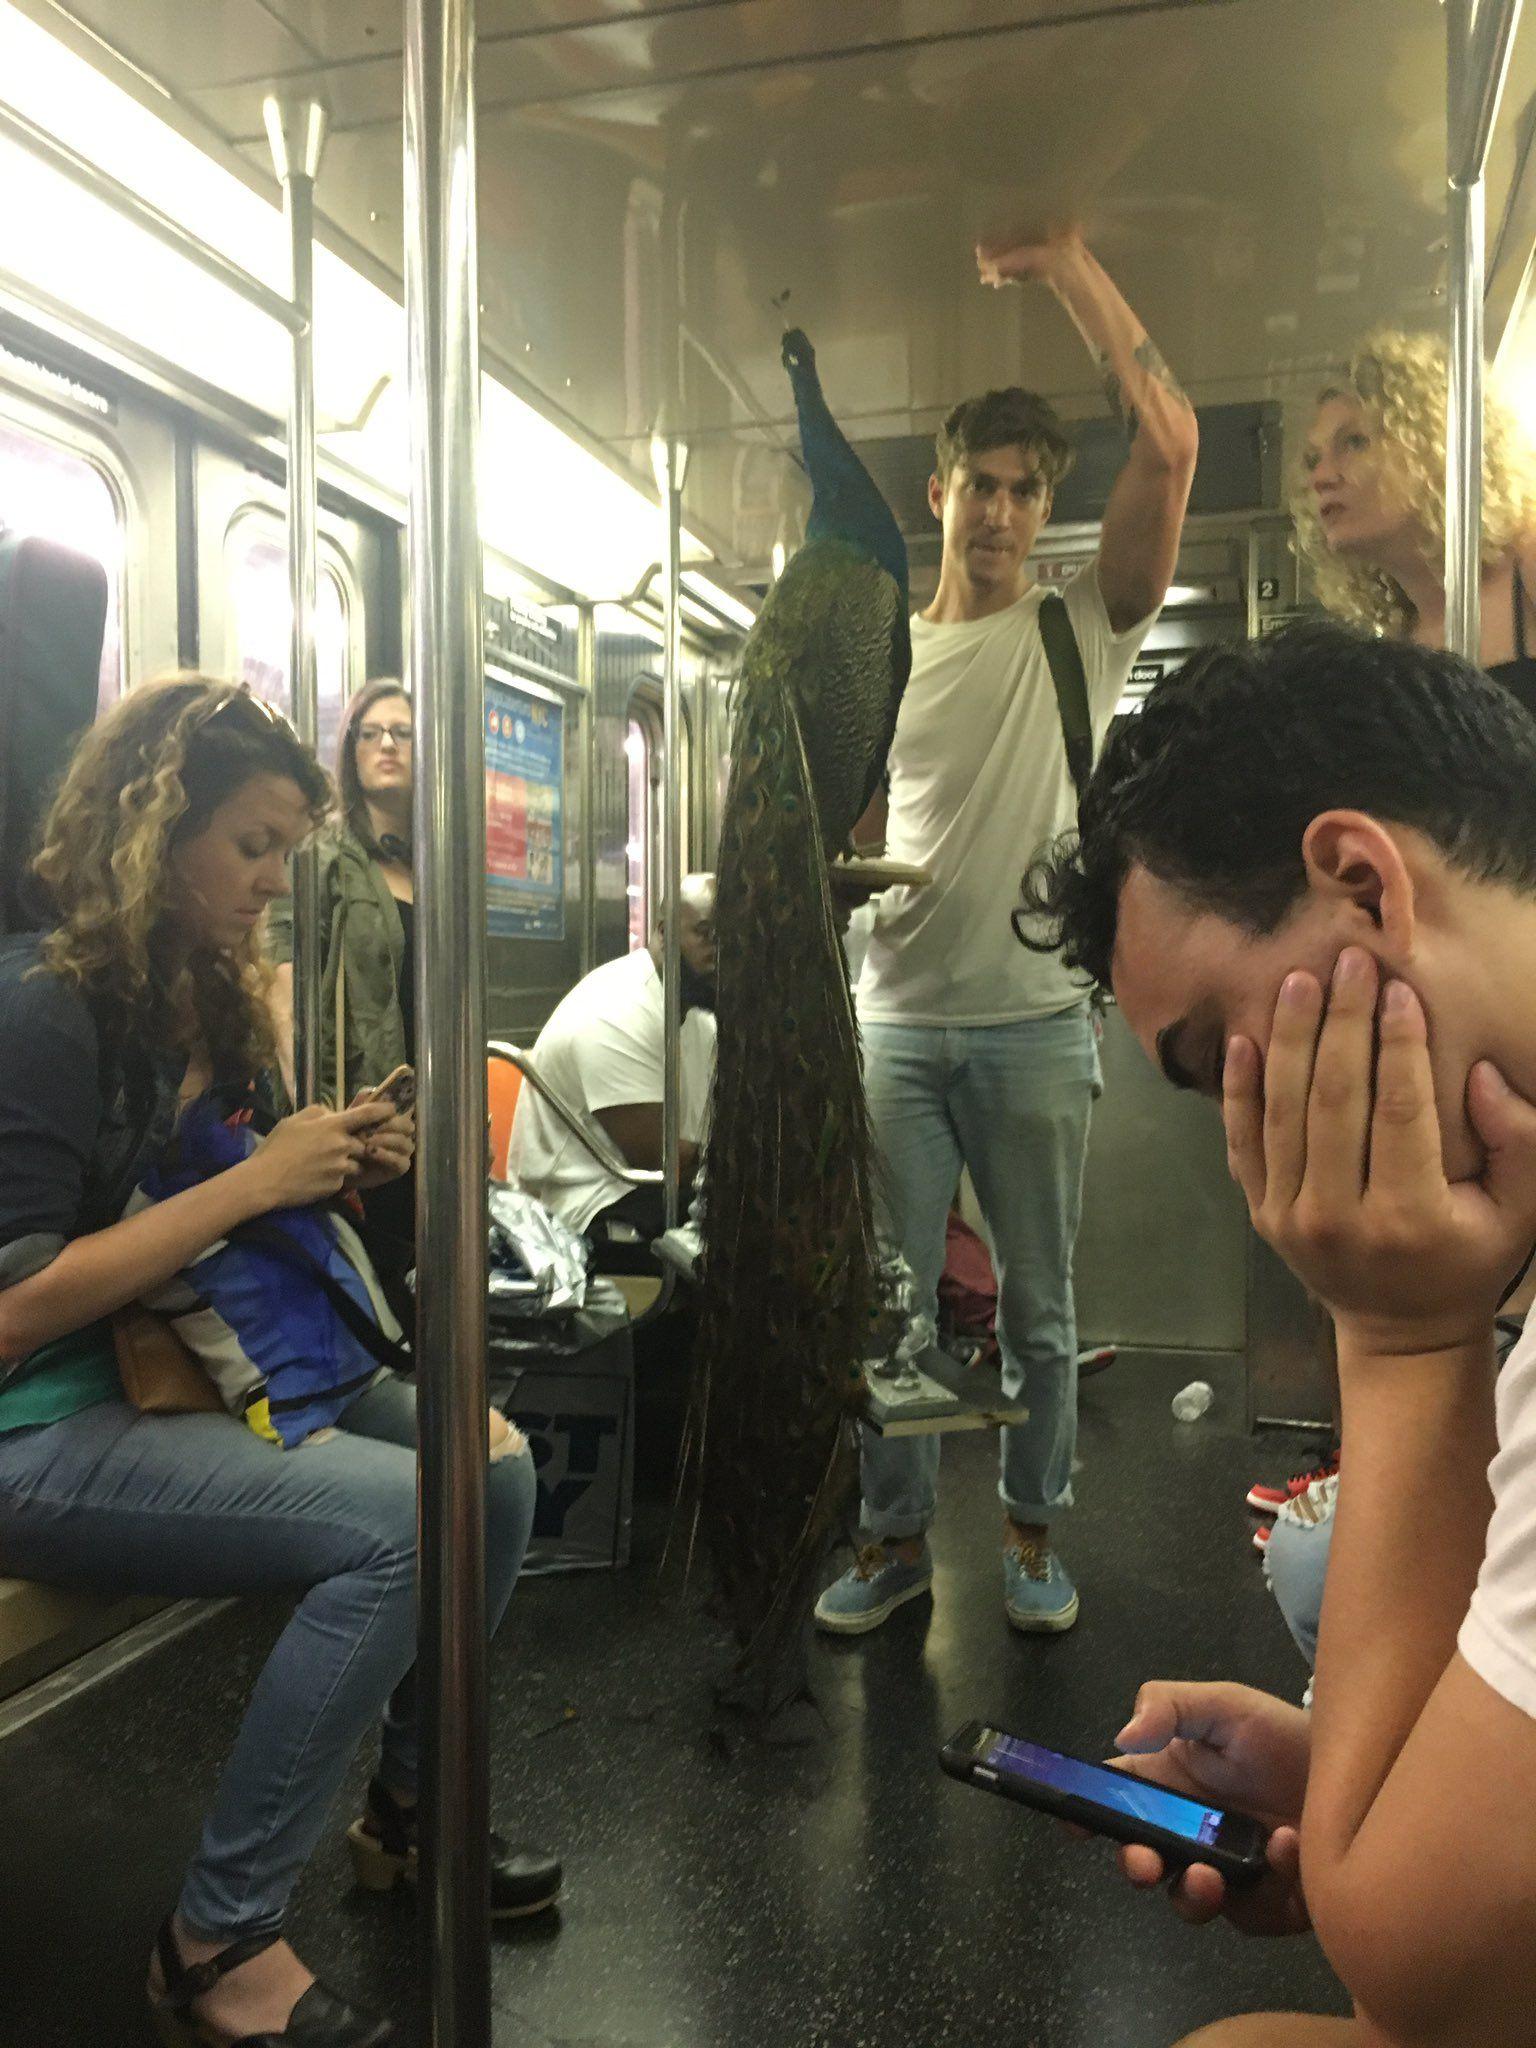 Matthew Chayes On Twitter Nyc Subway New York Subway Funny Photos